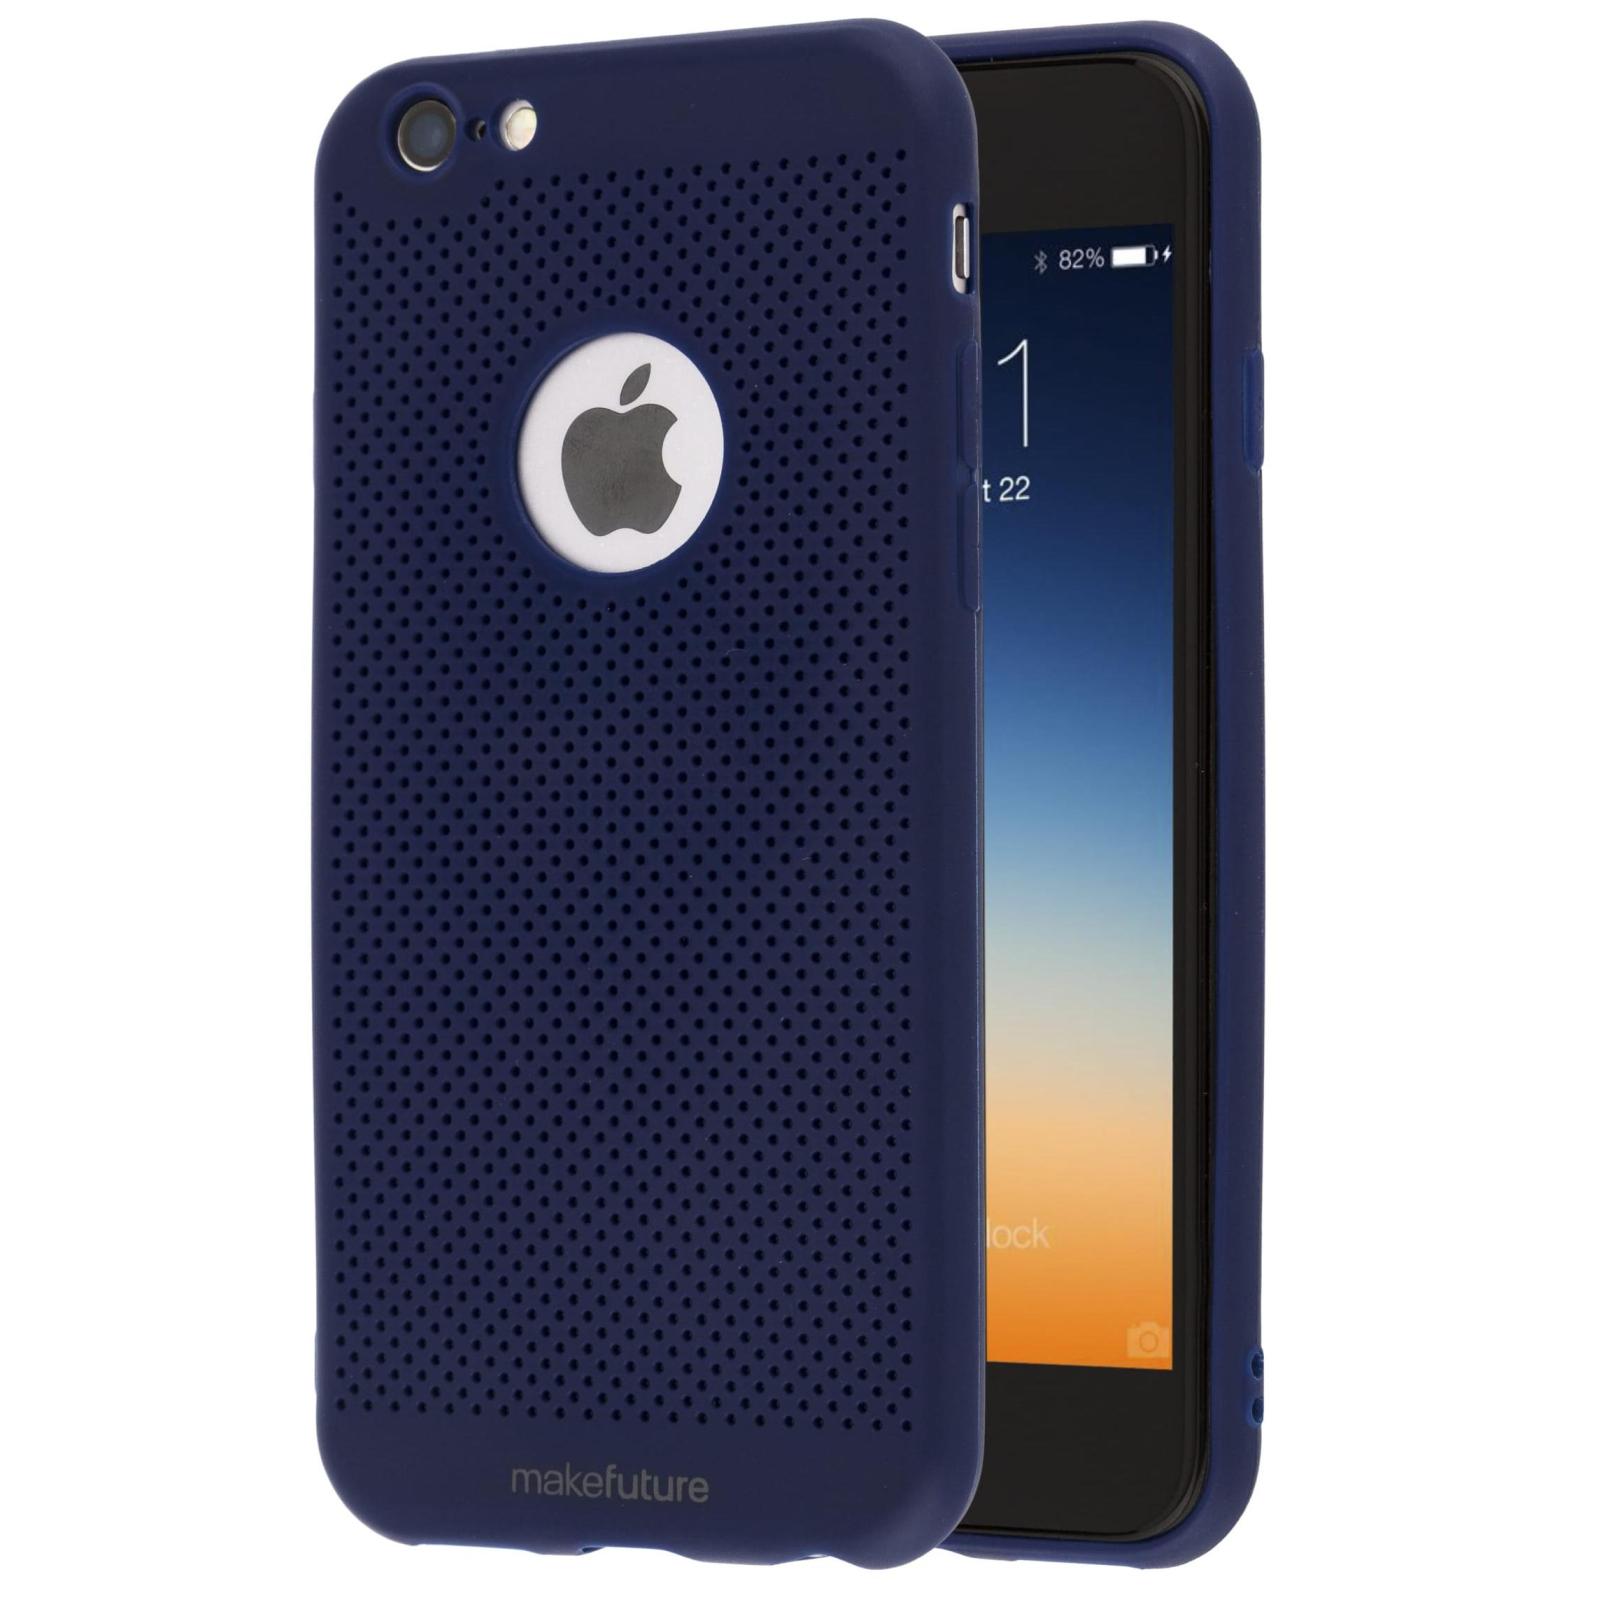 Чехол для моб. телефона MakeFuture Moon Case (TPU) для Apple iPhone 6 Blue (MCM-AI6BL) изображение 2